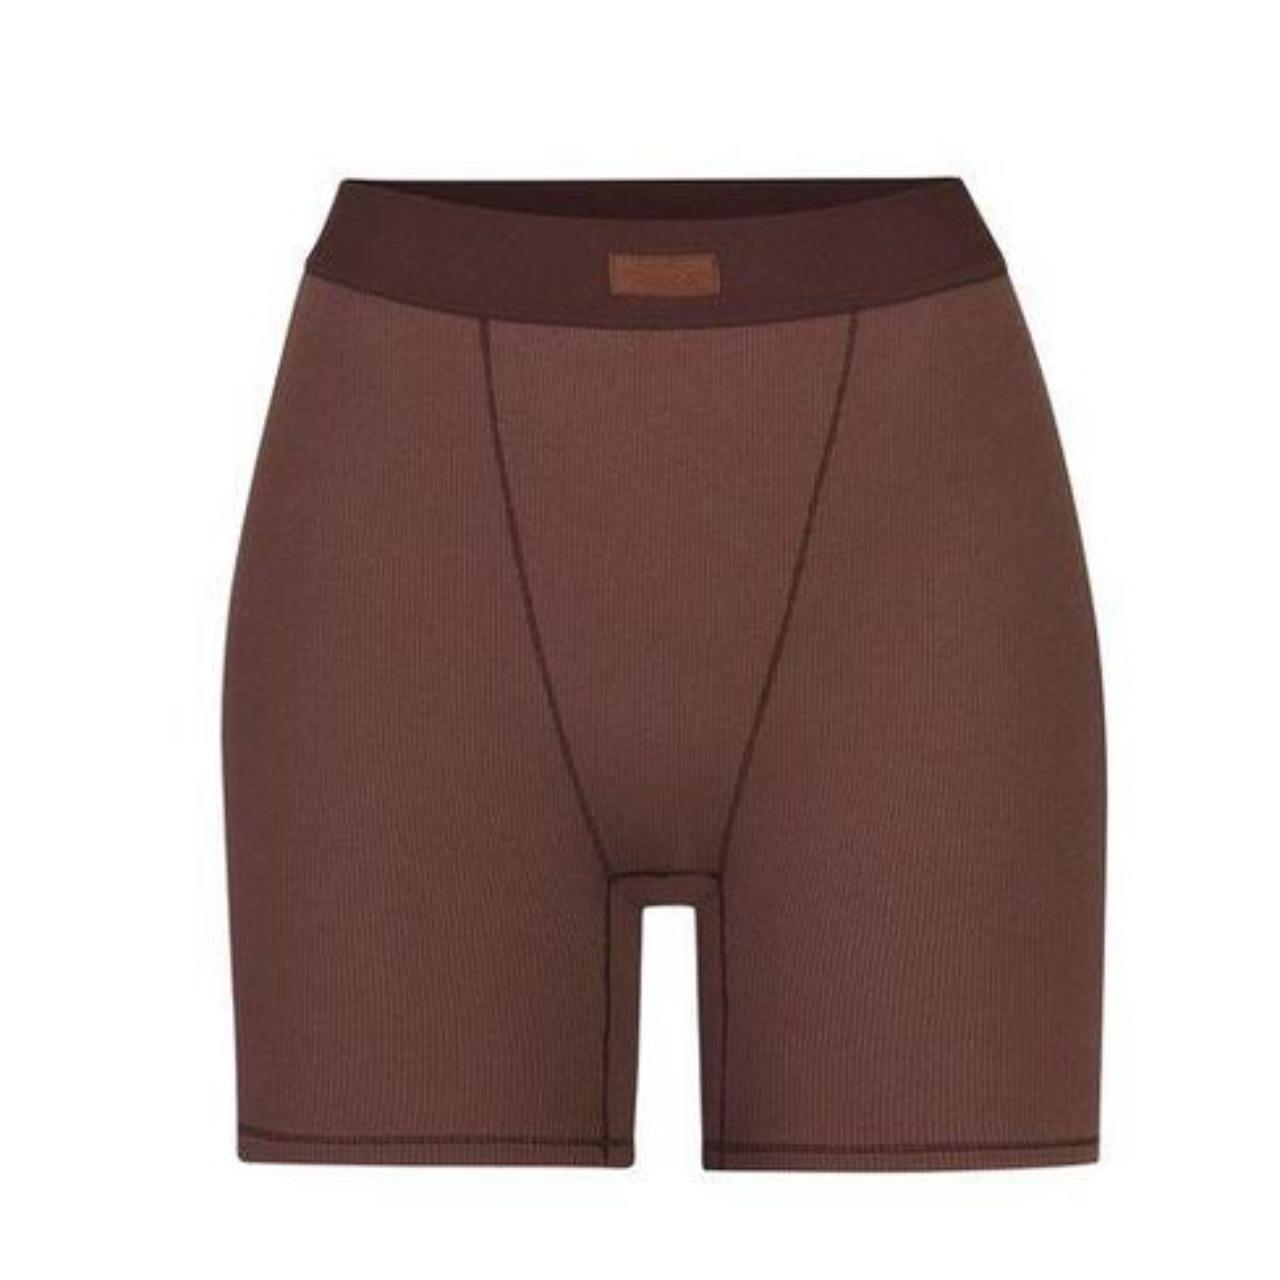 Product Image 1 - Skims Garnet Boxers Size XXS Worn like